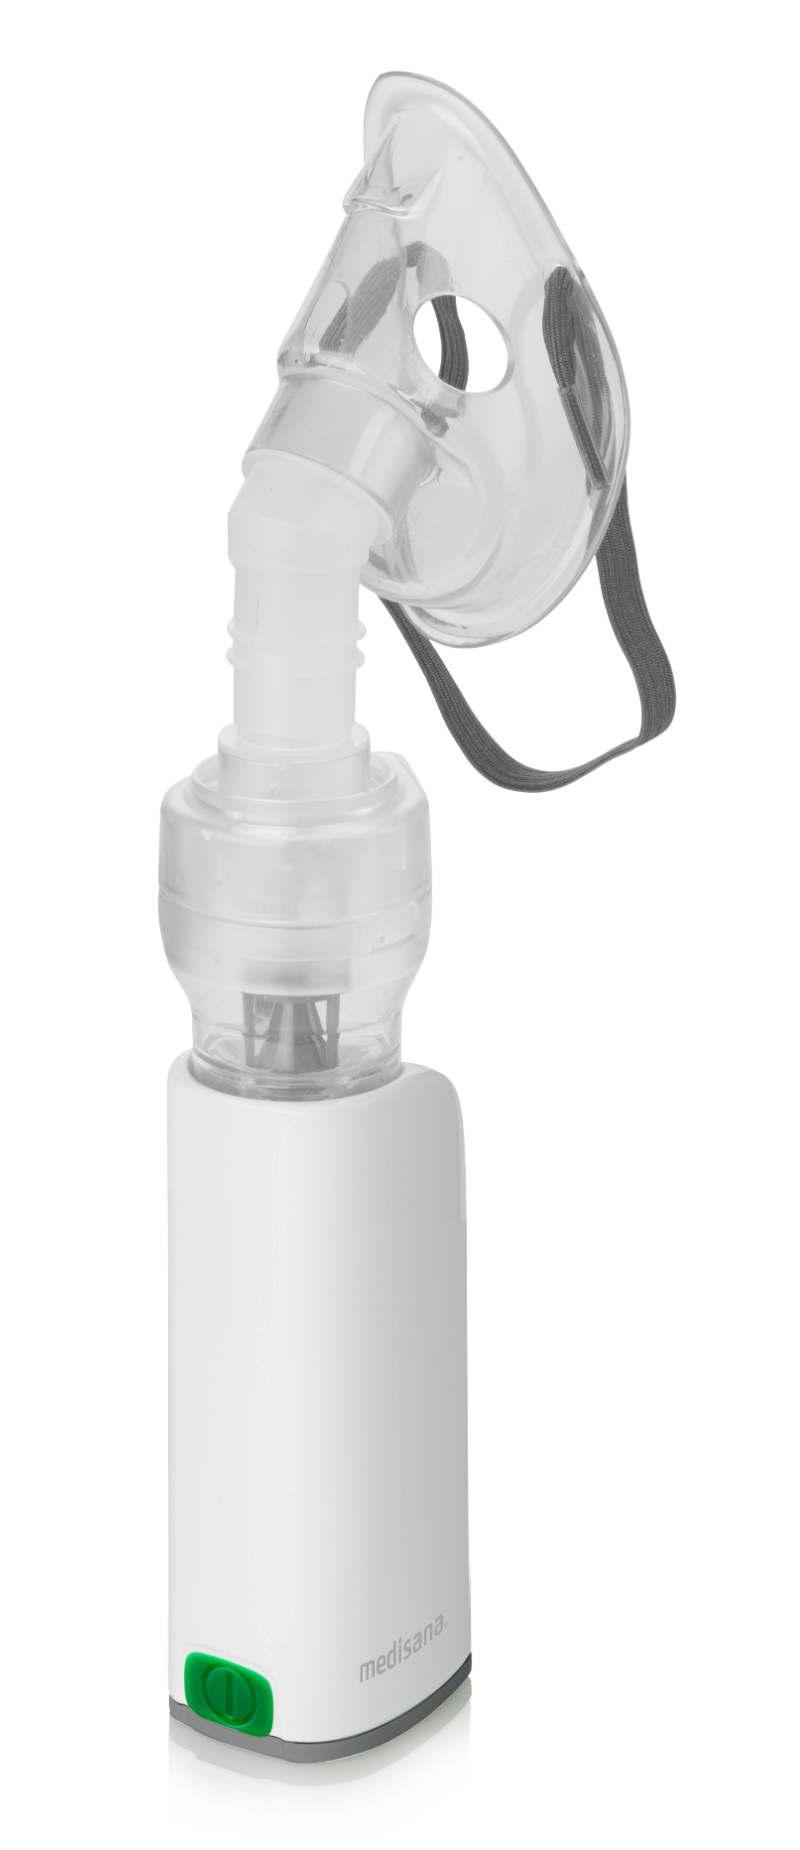 <h1>Medisana Inhalator IN 530</h1><h3 style='font-size: 20px; margin: 0px 0px 15px 0px;'> -Mikrokompressortechnik, Akku-Betrieb</h3>